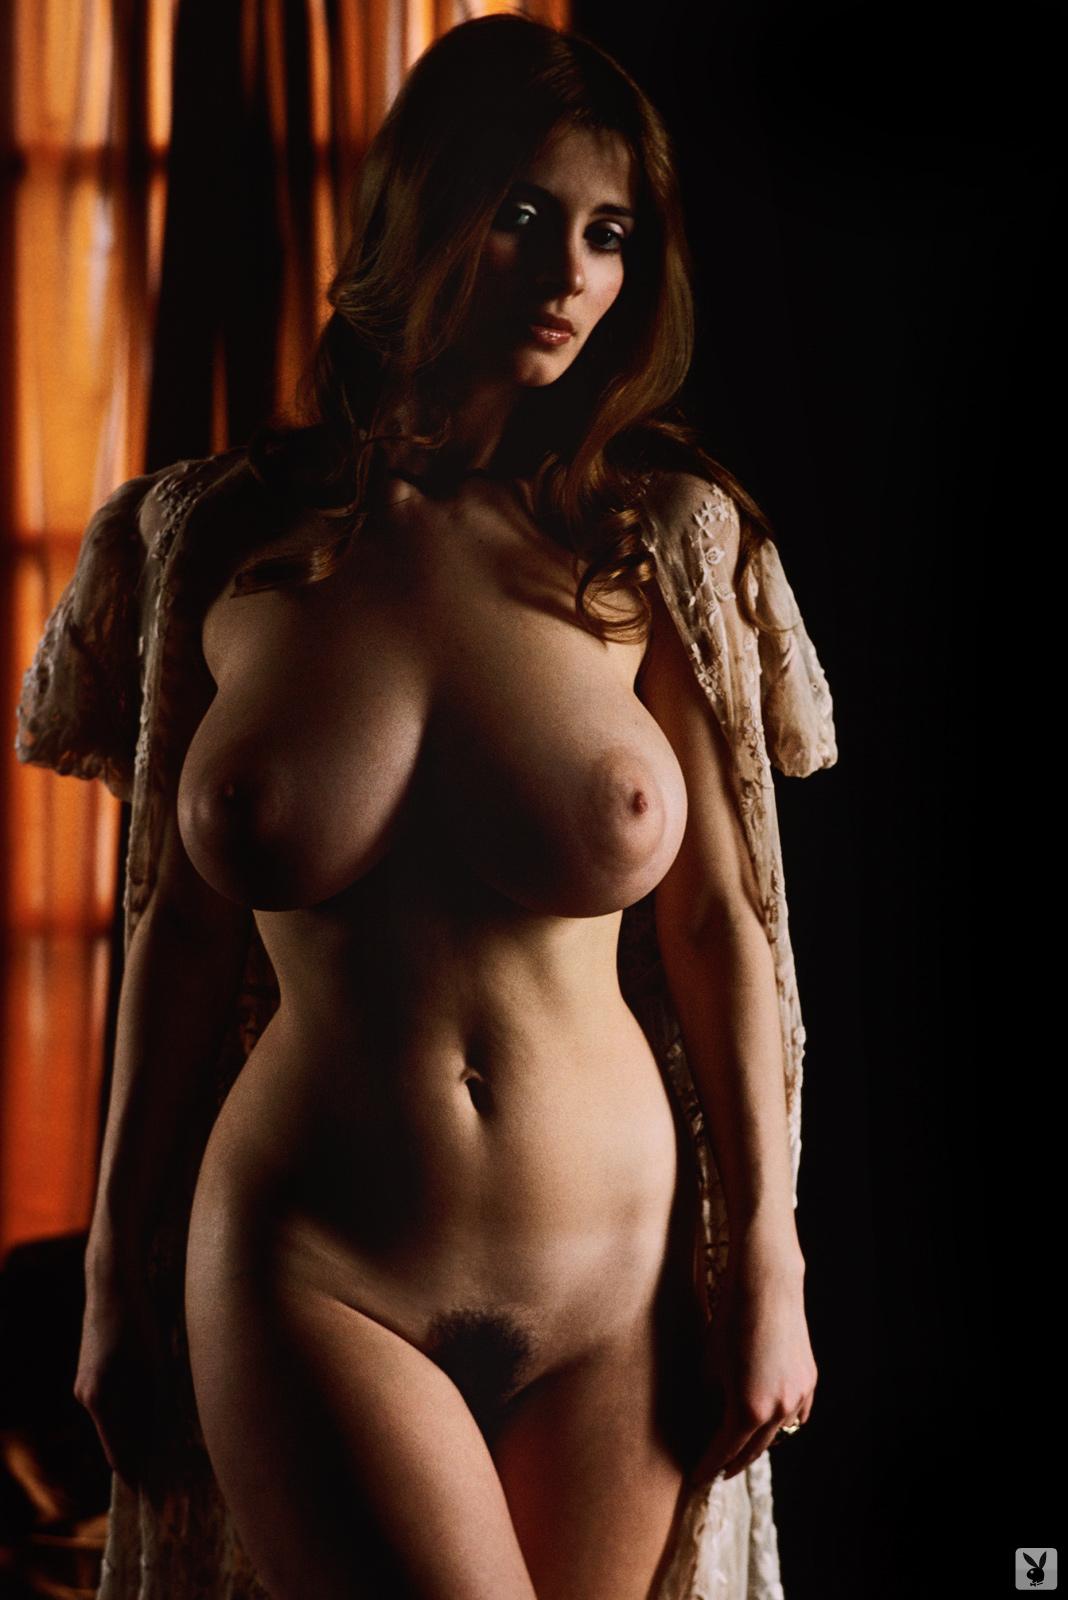 Яблочко sexy fully naked black women